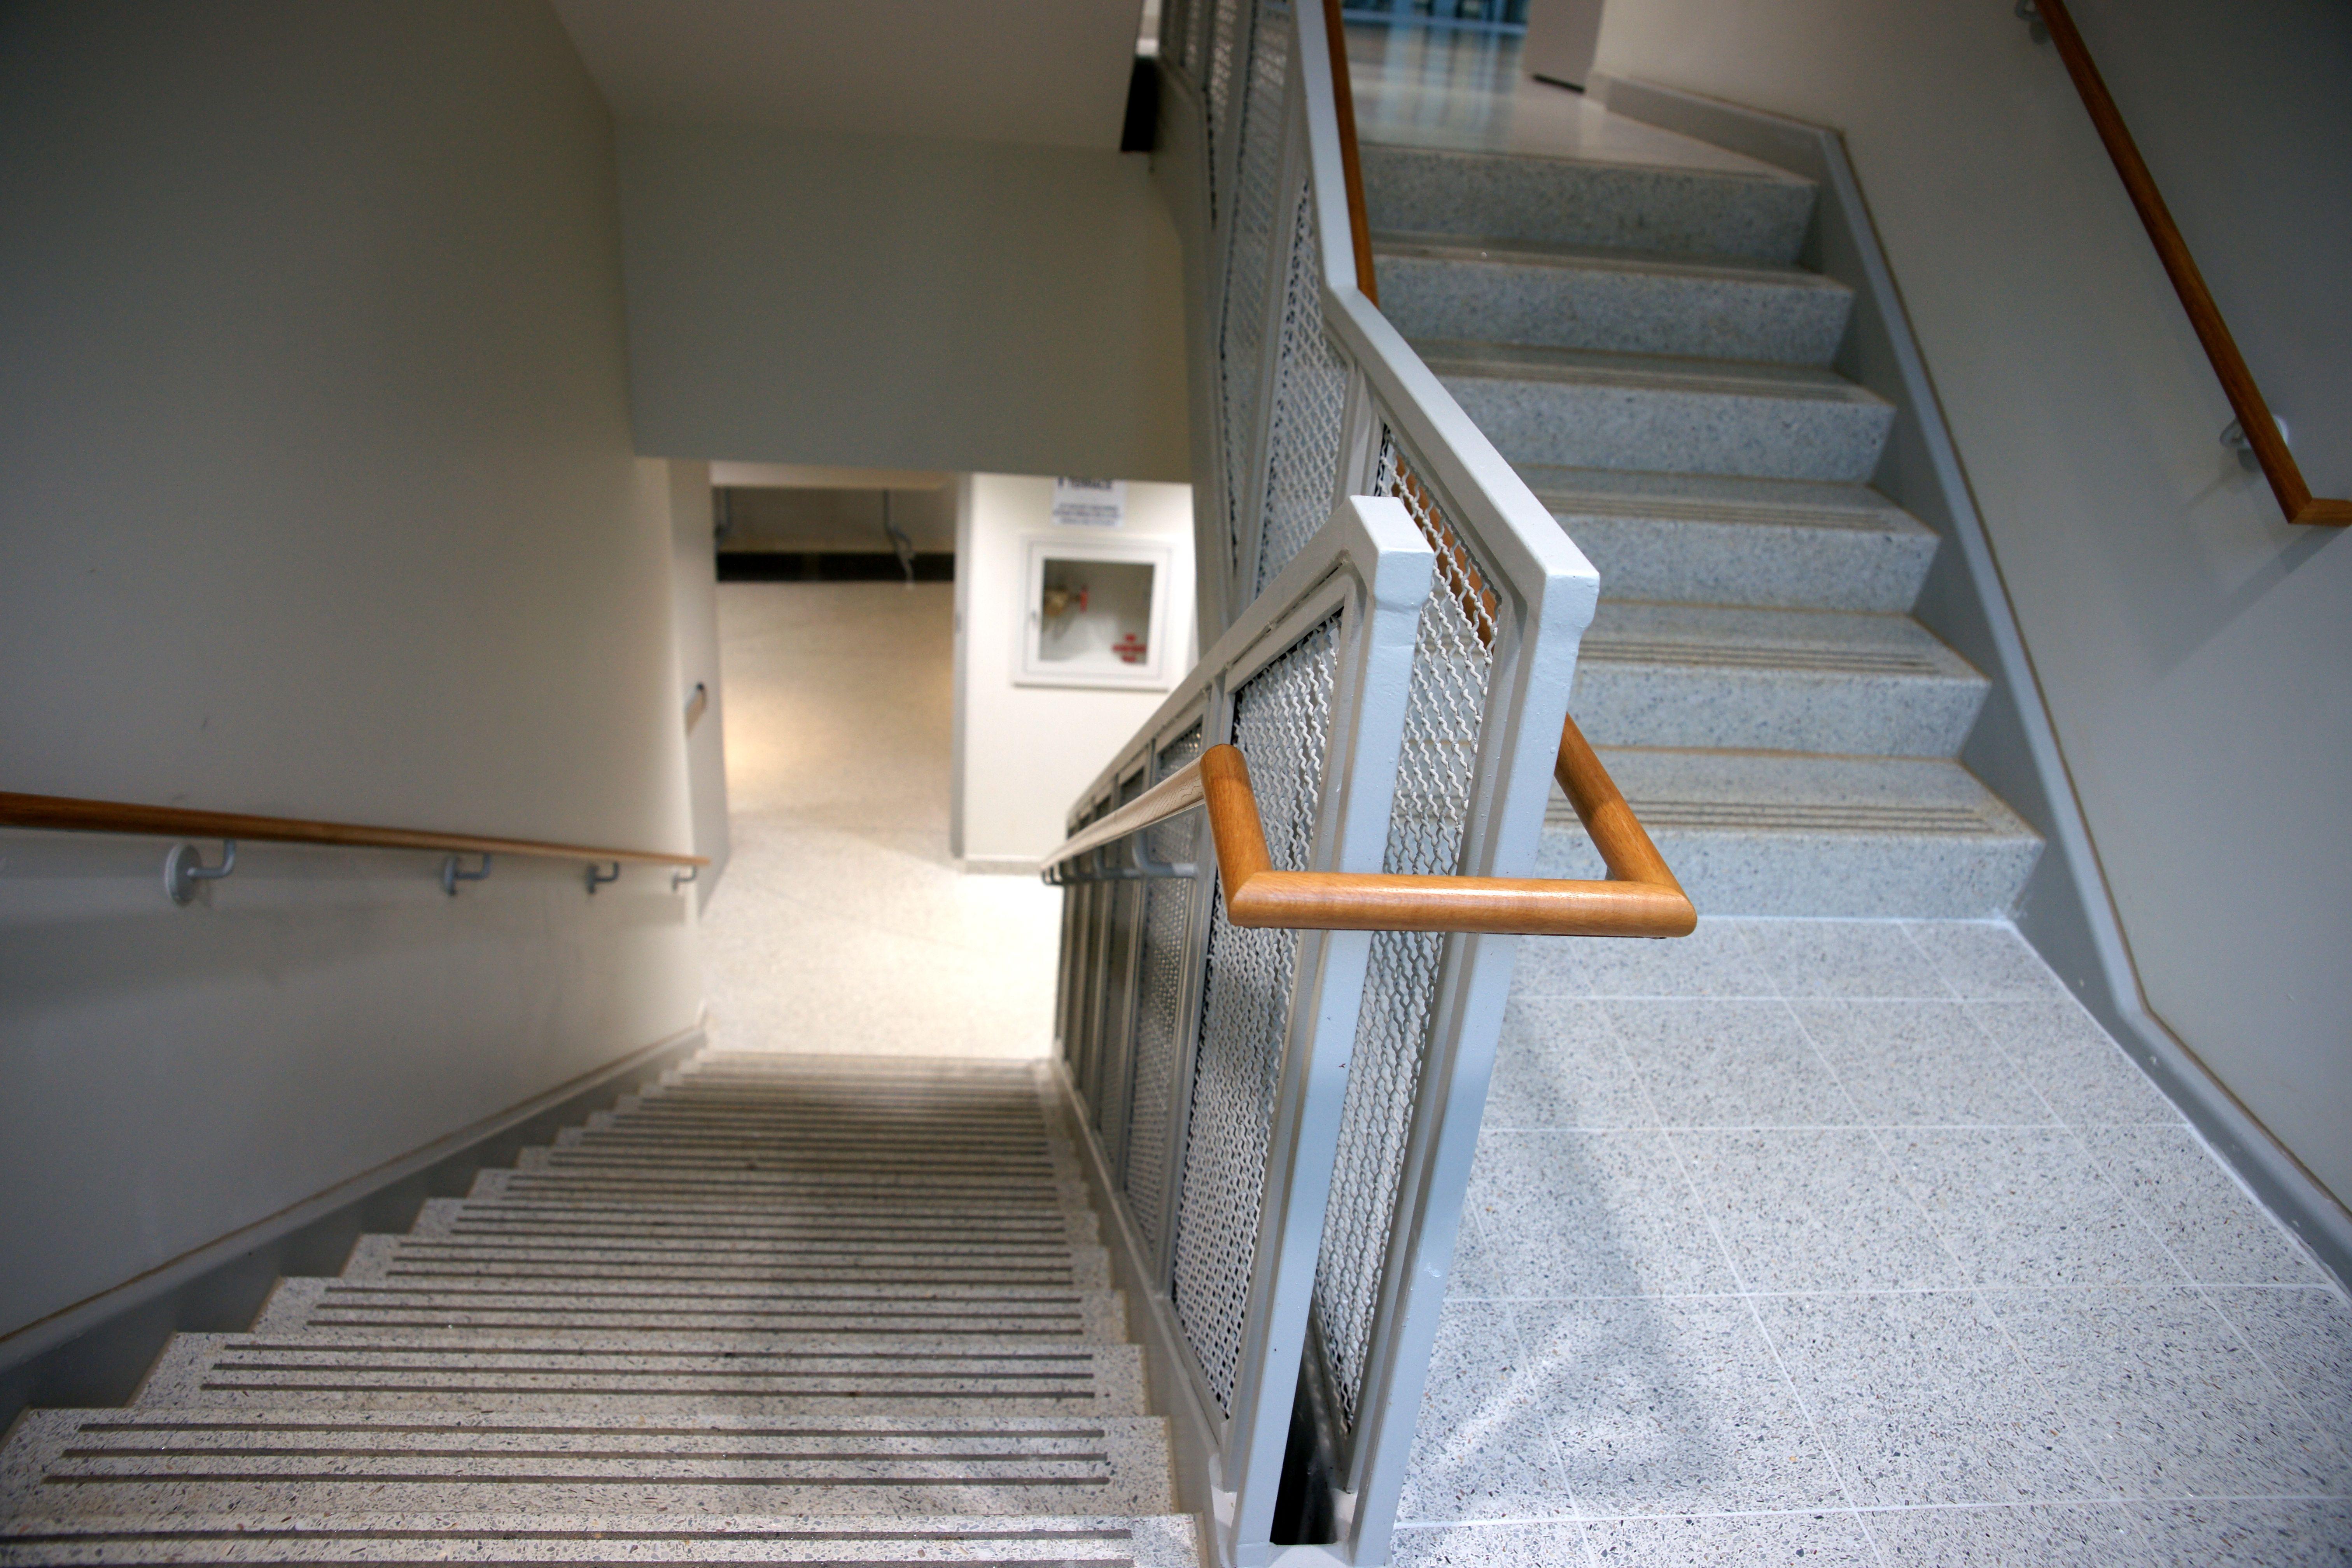 Epoxy Precast Terrazzo Stair Treads And Riser Combos Www.terrazzco.com # Staircase #terrazzo #precast #stairs #treads